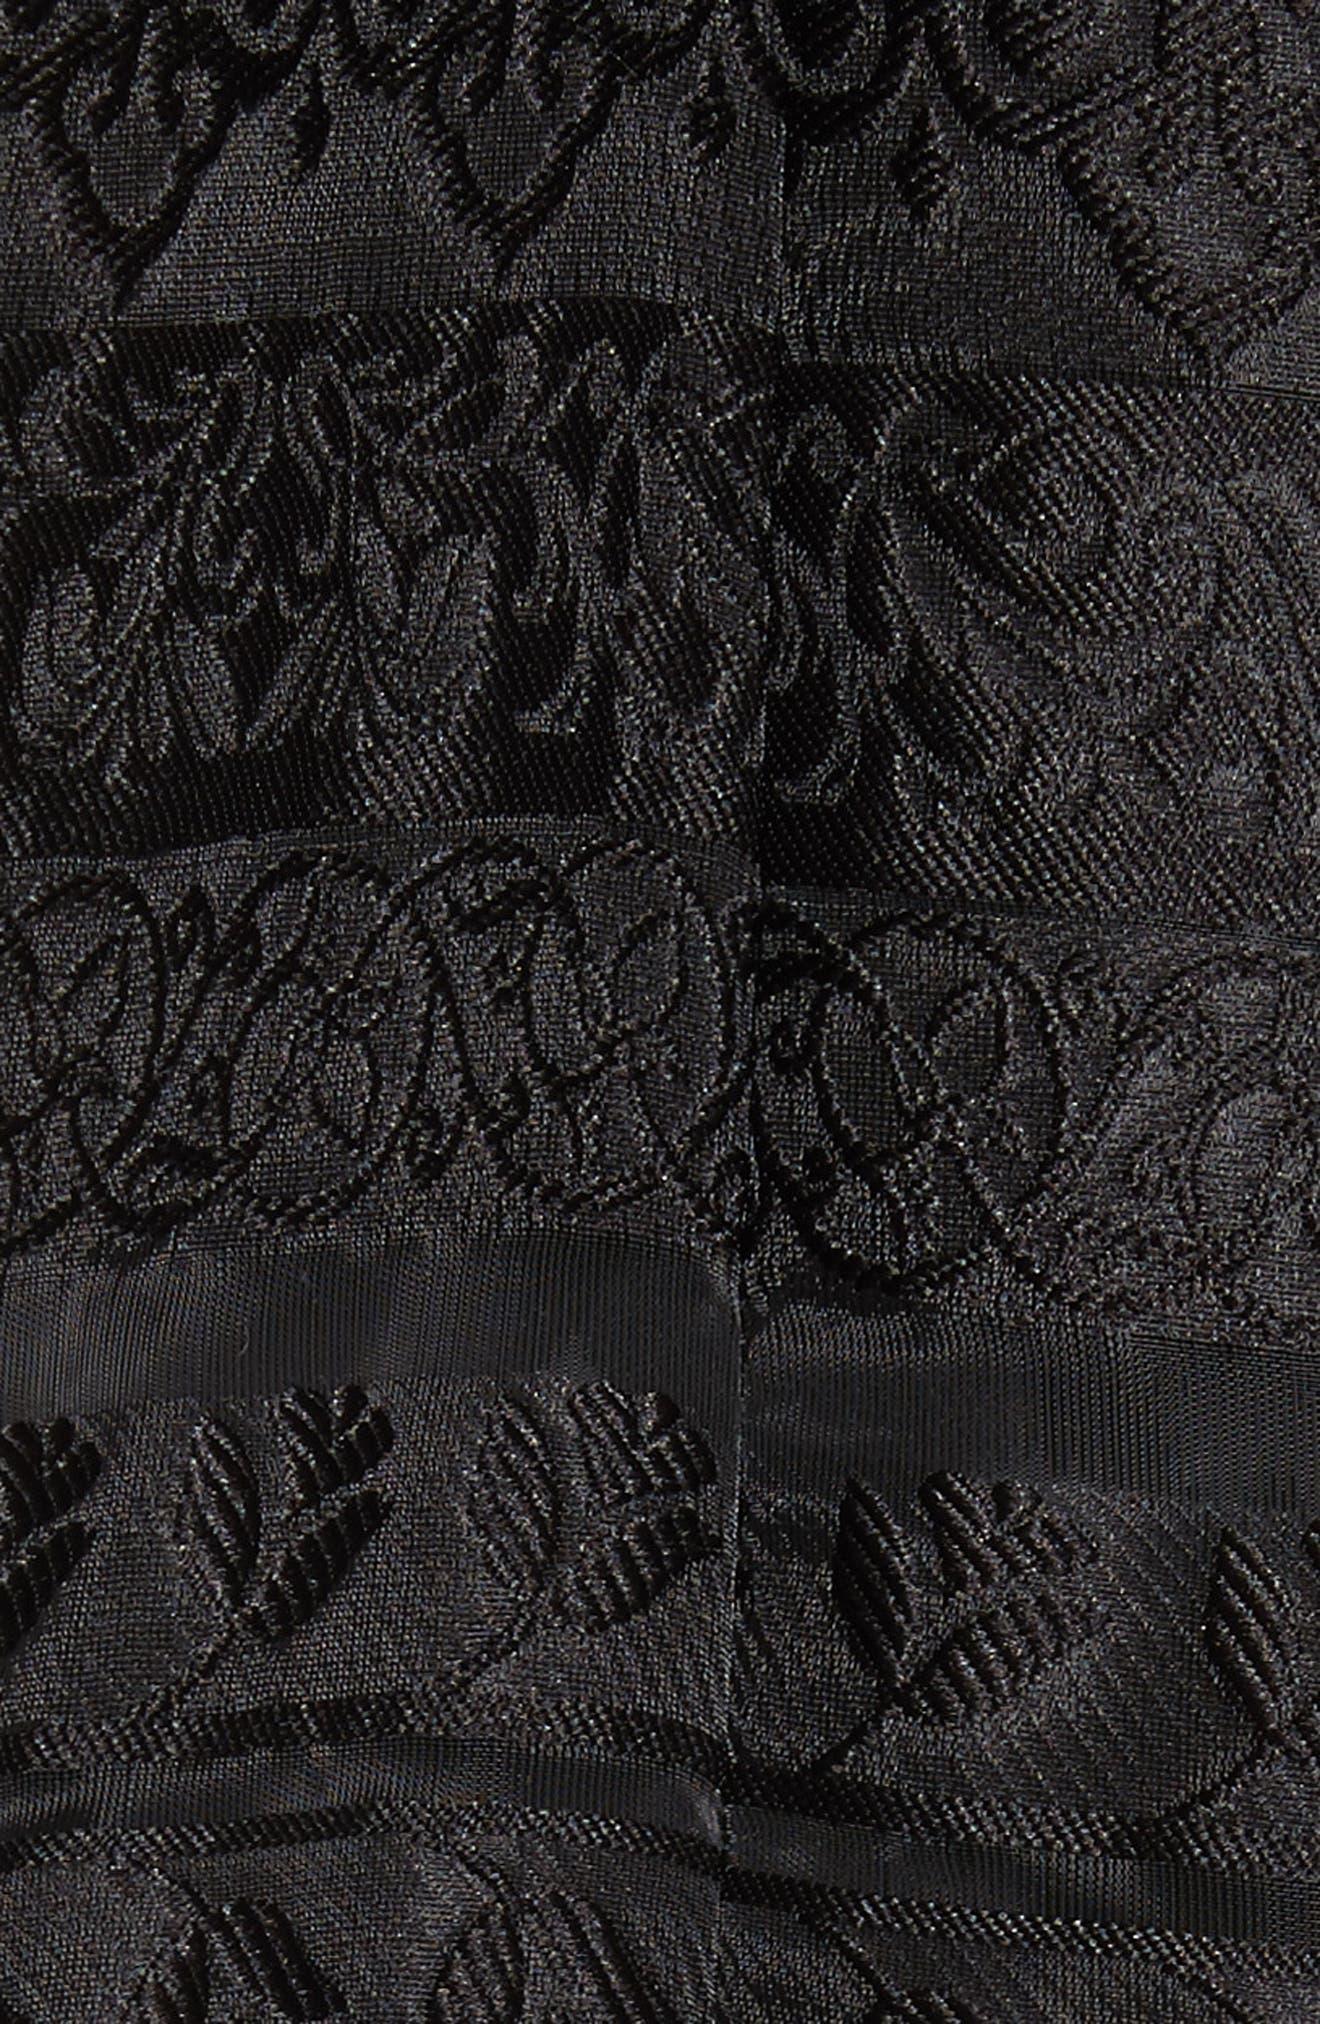 Noir Istiklal Embellished Strapless Ballgown,                             Alternate thumbnail 5, color,                             001